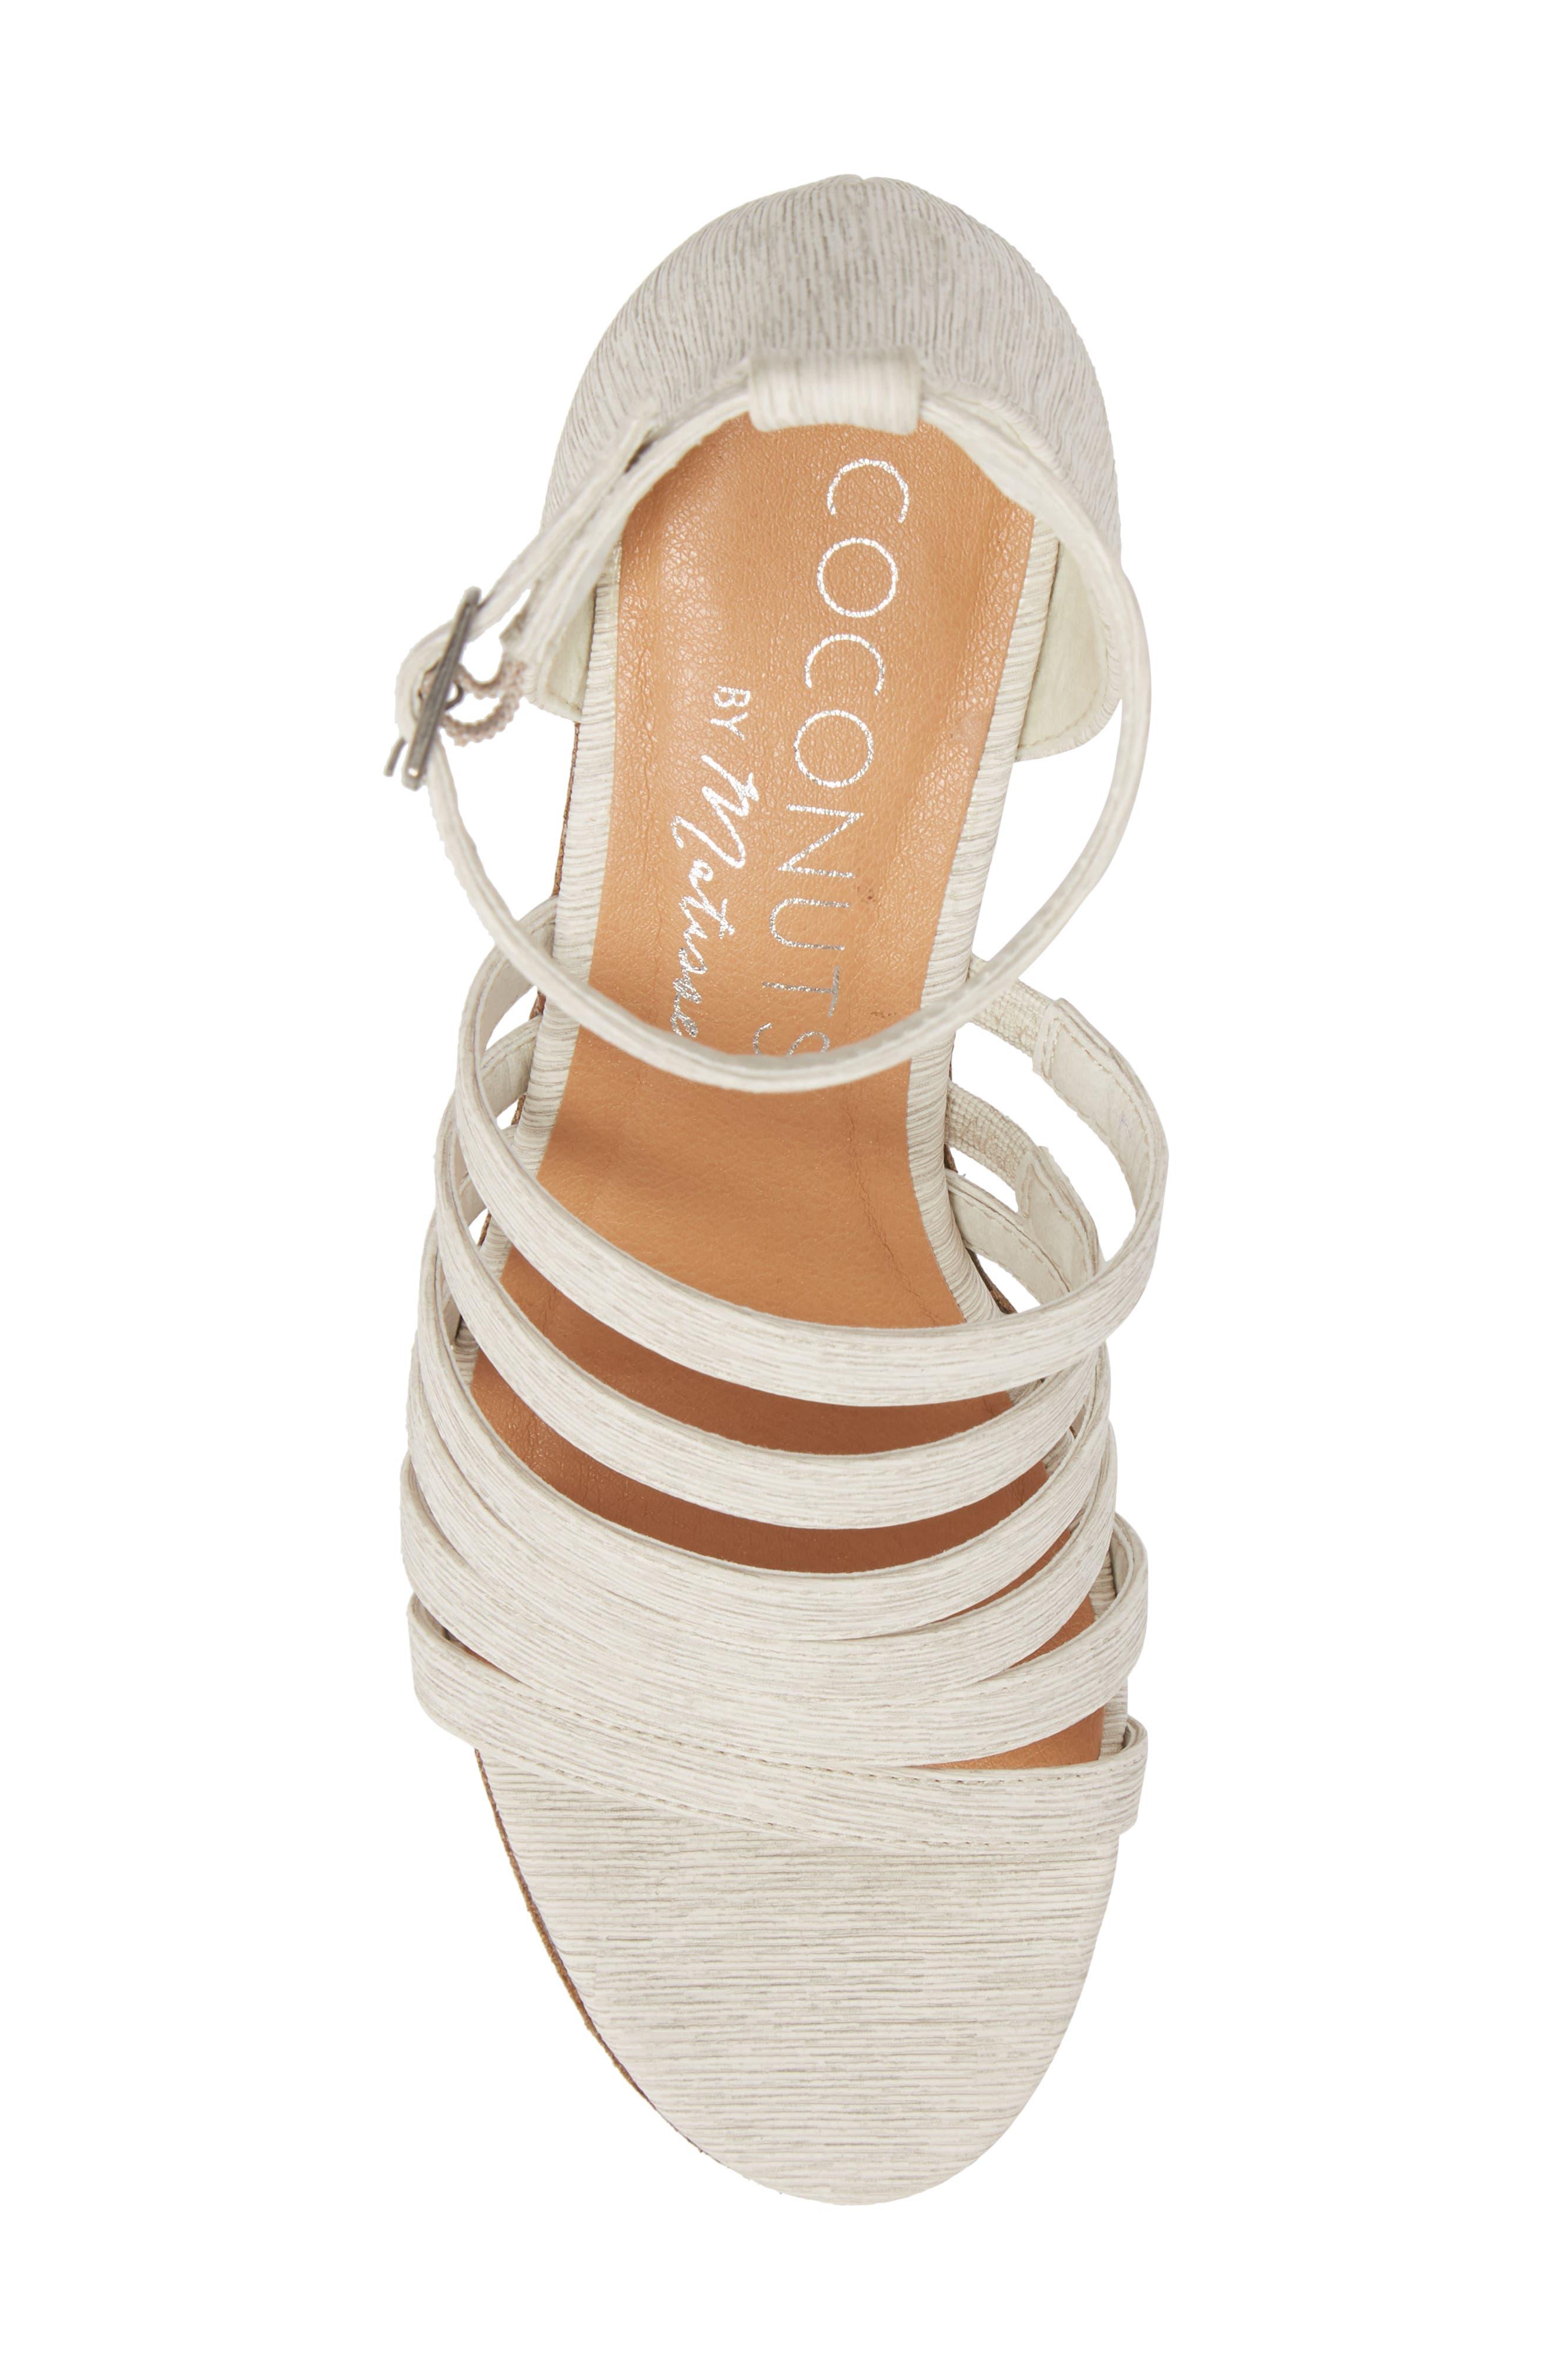 Kiera Wedge Sandal,                             Alternate thumbnail 5, color,                             NATURAL FABRIC